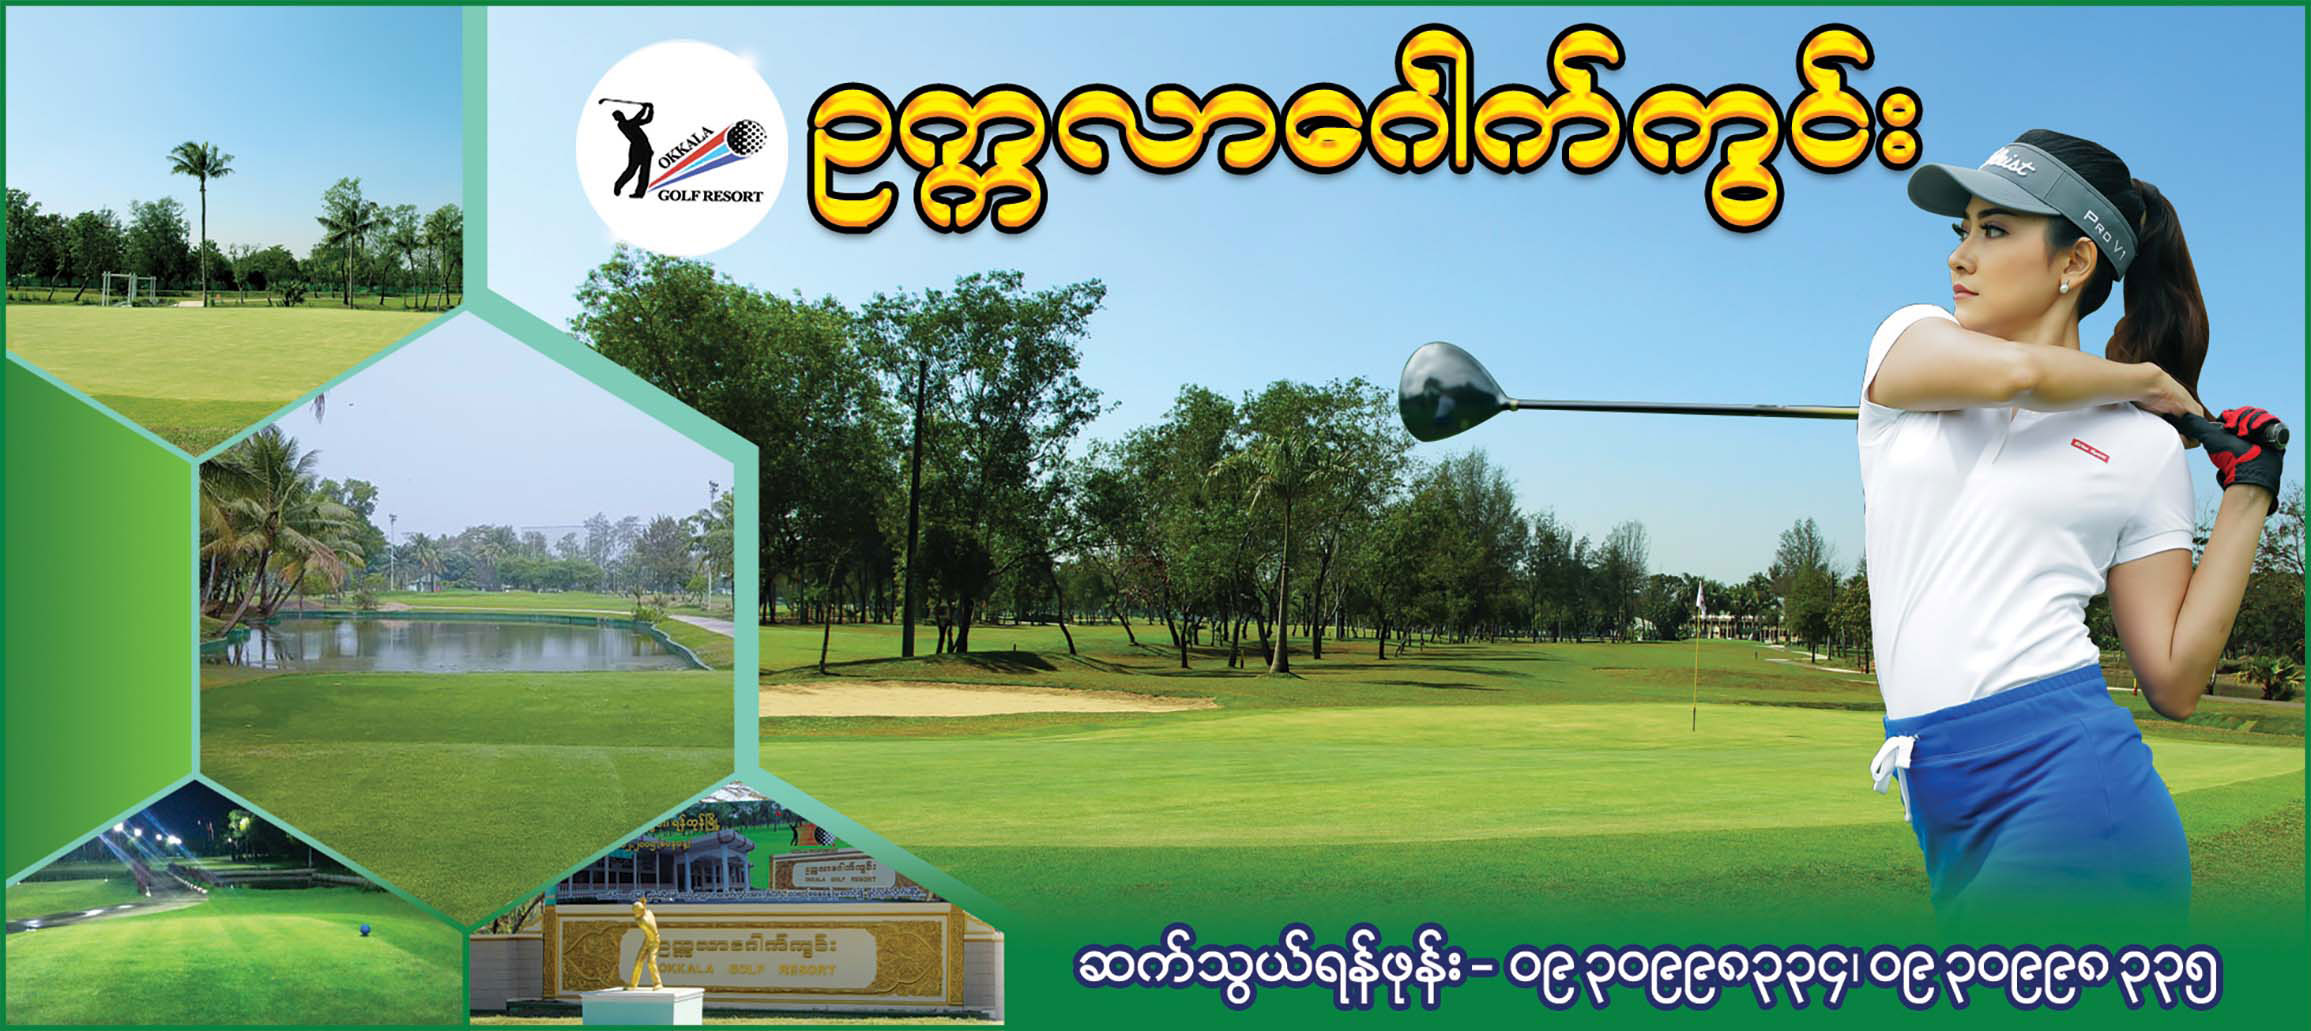 Okkala Golf Course